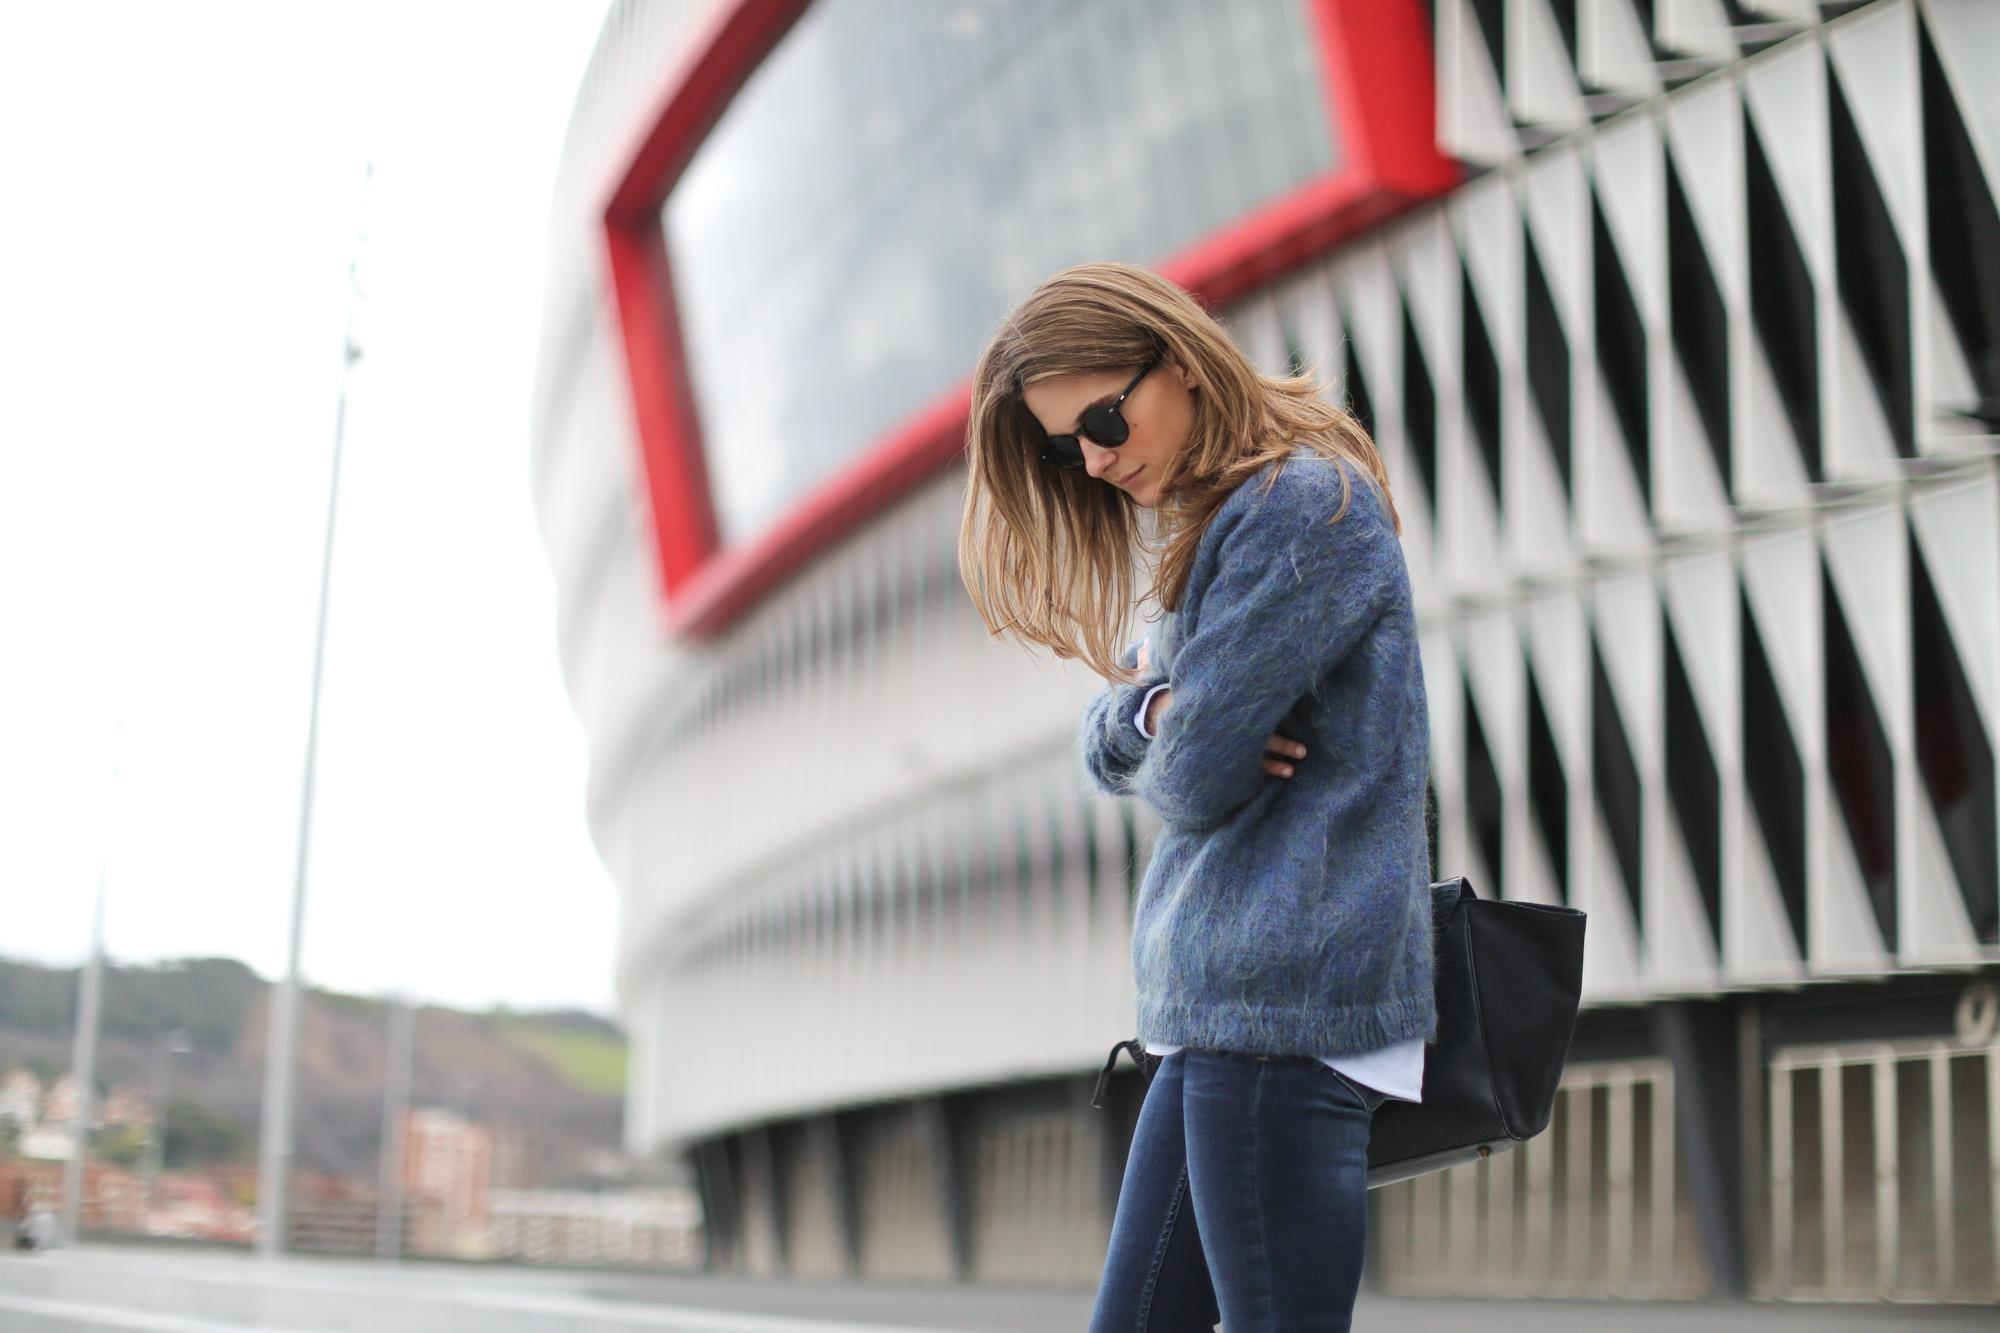 Clochet-streetstyle-bimbaylola-blue-knit-topshop-baxter-jeans-sushibag-8